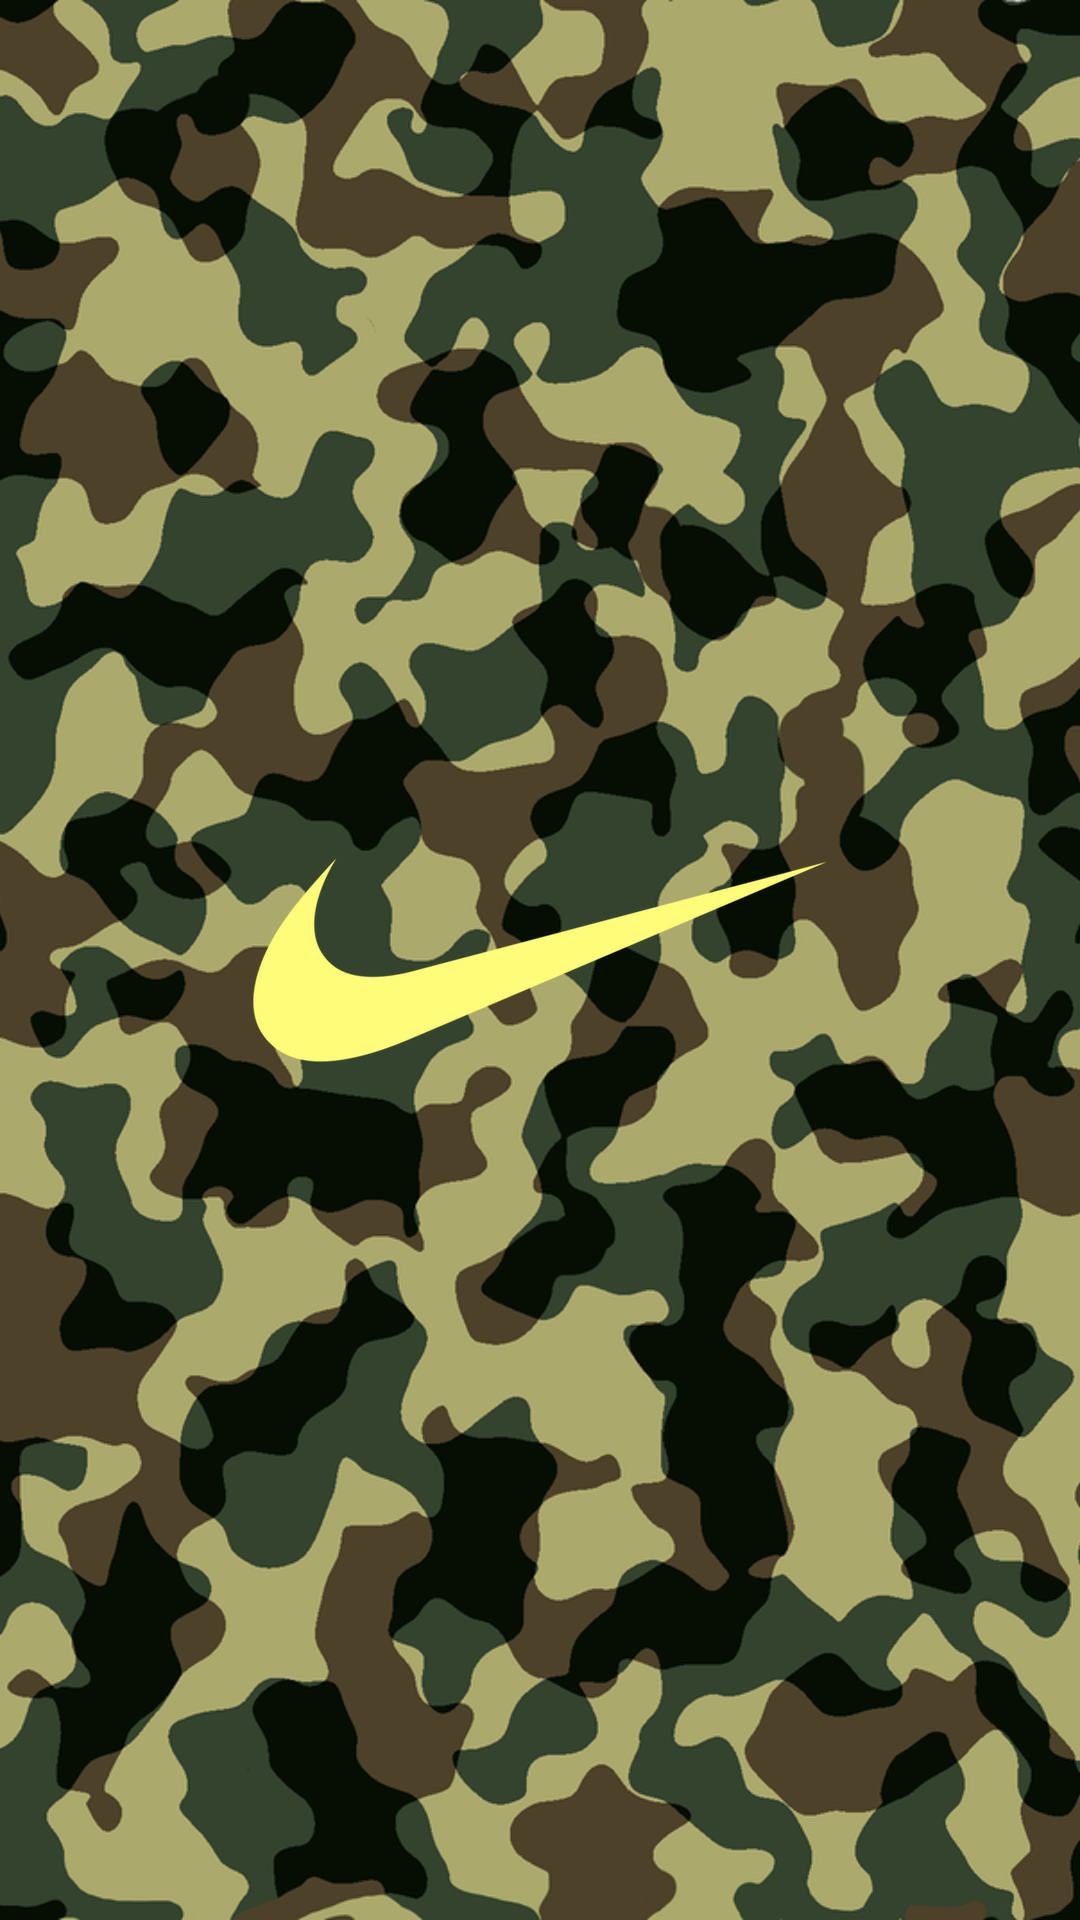 NIKE Logo Camouflage iPhone Wallpaper